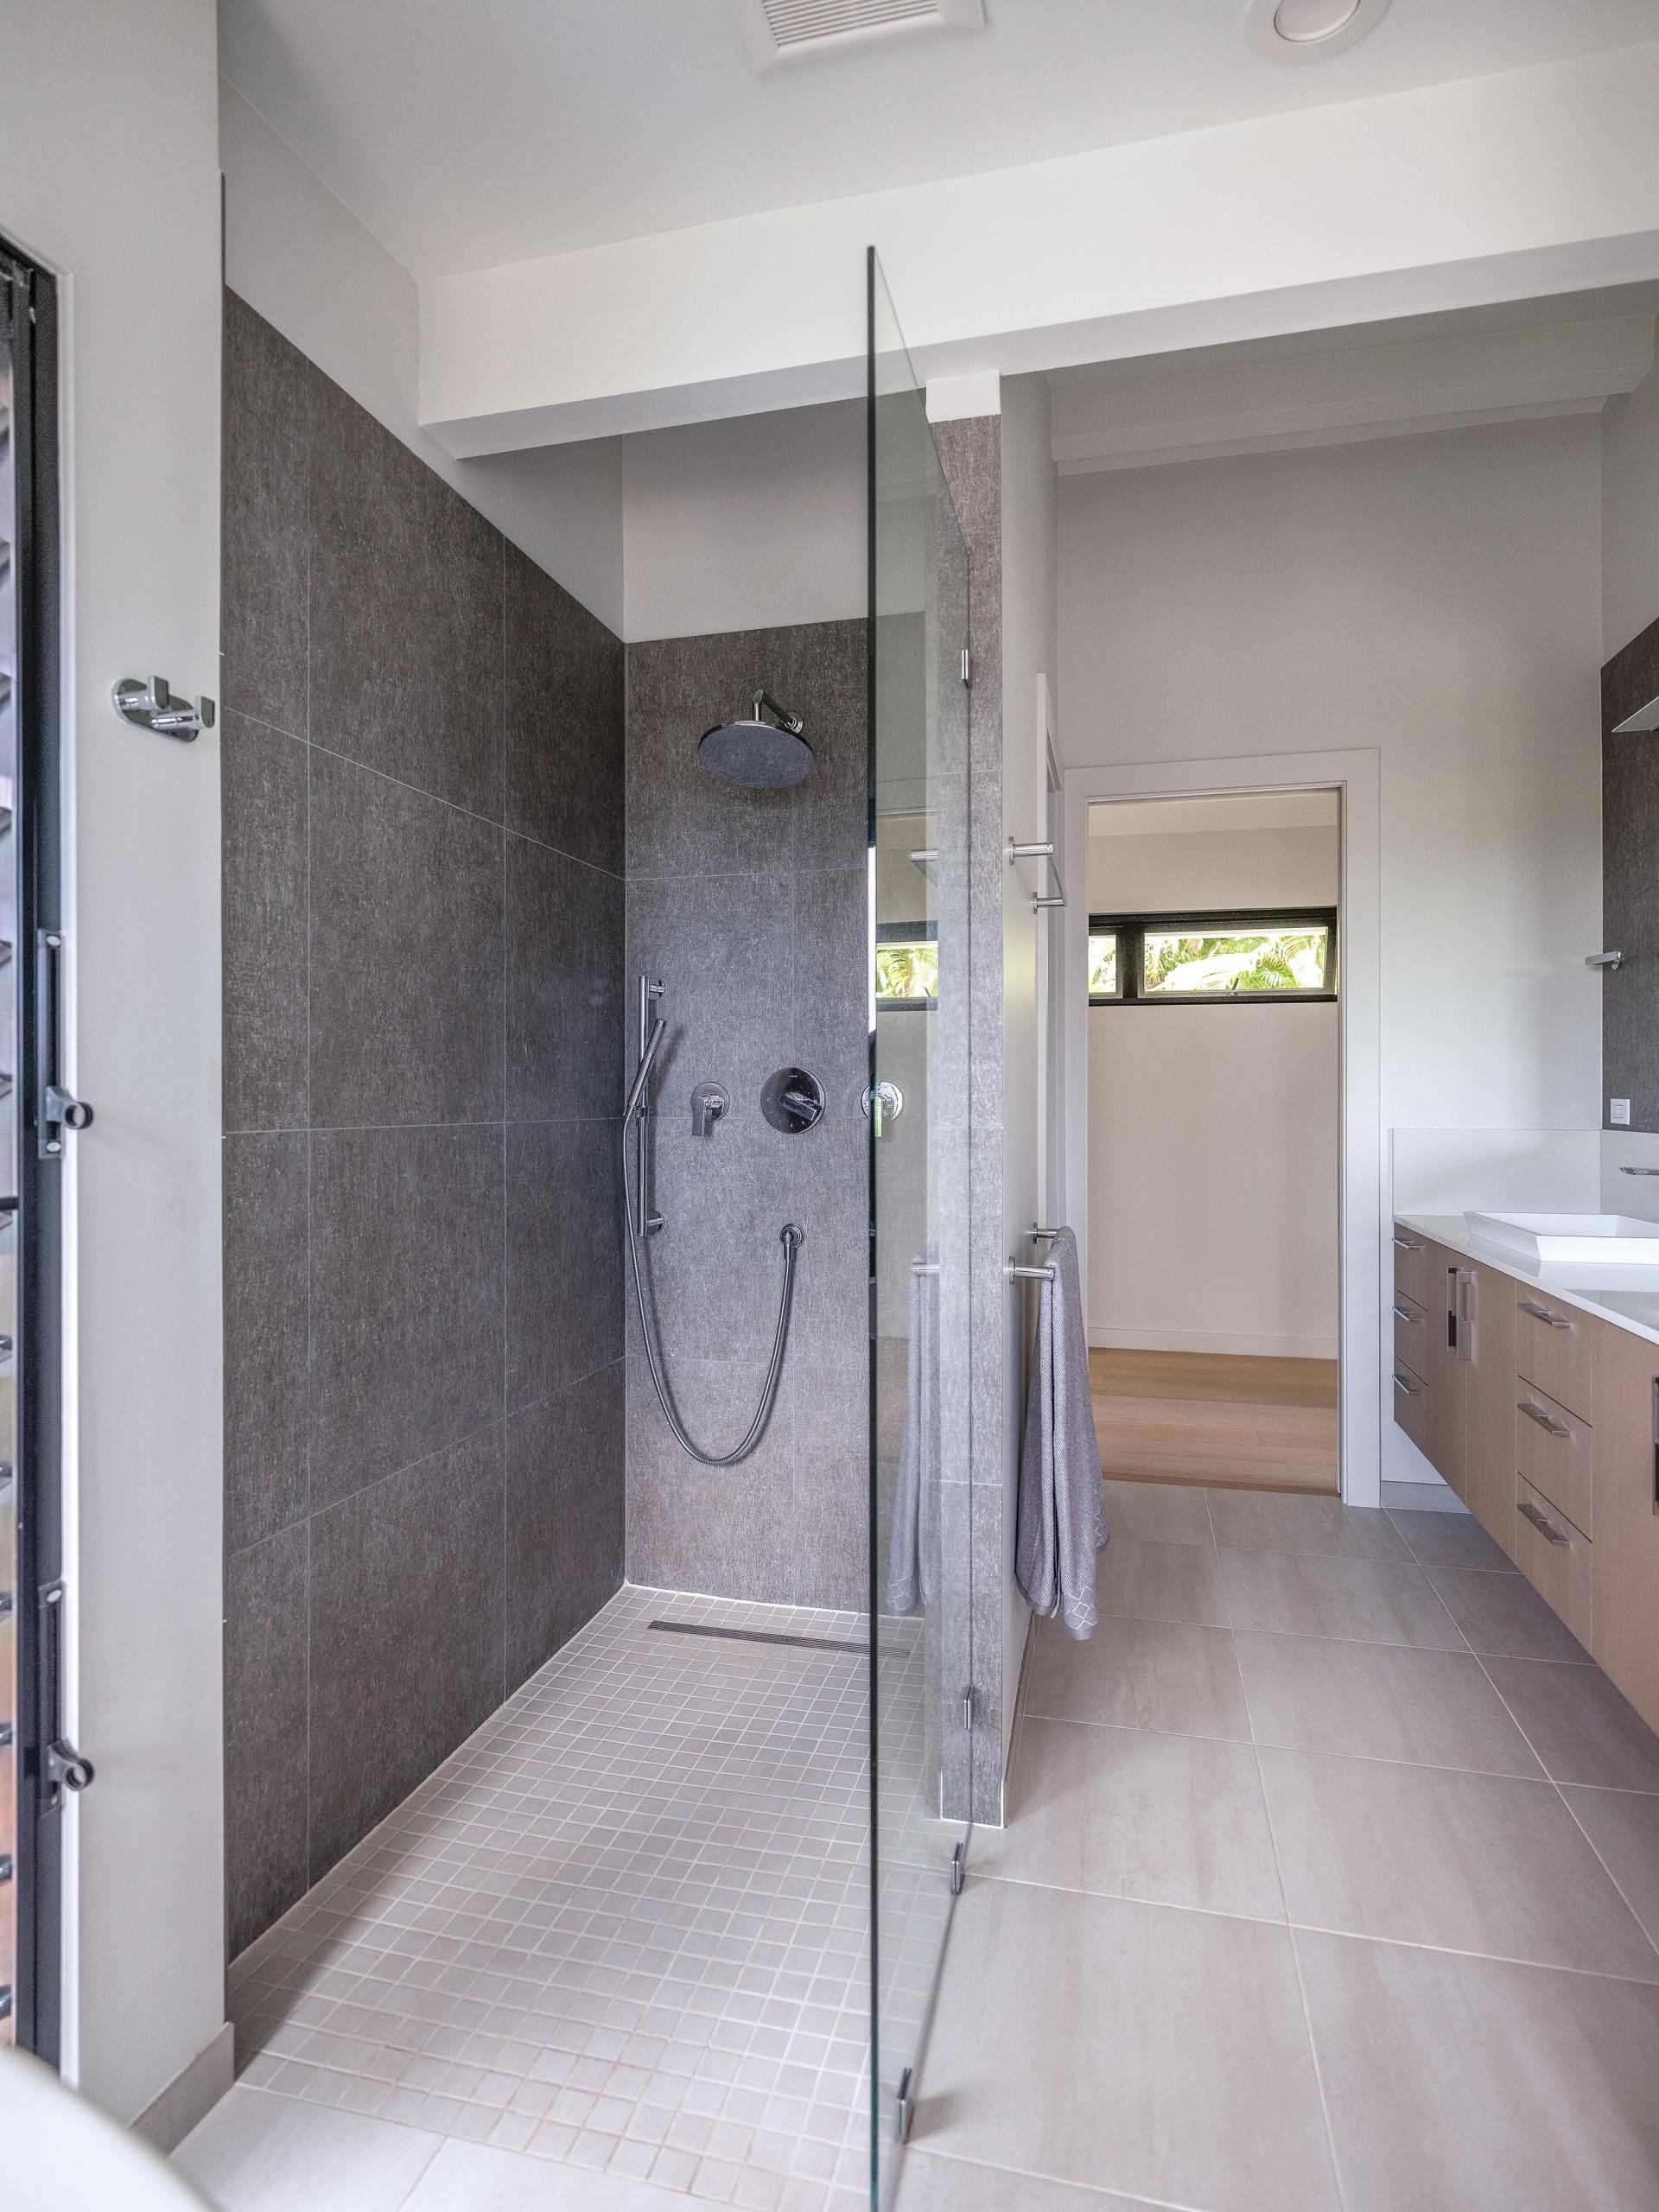 08 21 Hhr Feature Hawaii Kitchen Bath Bath 3